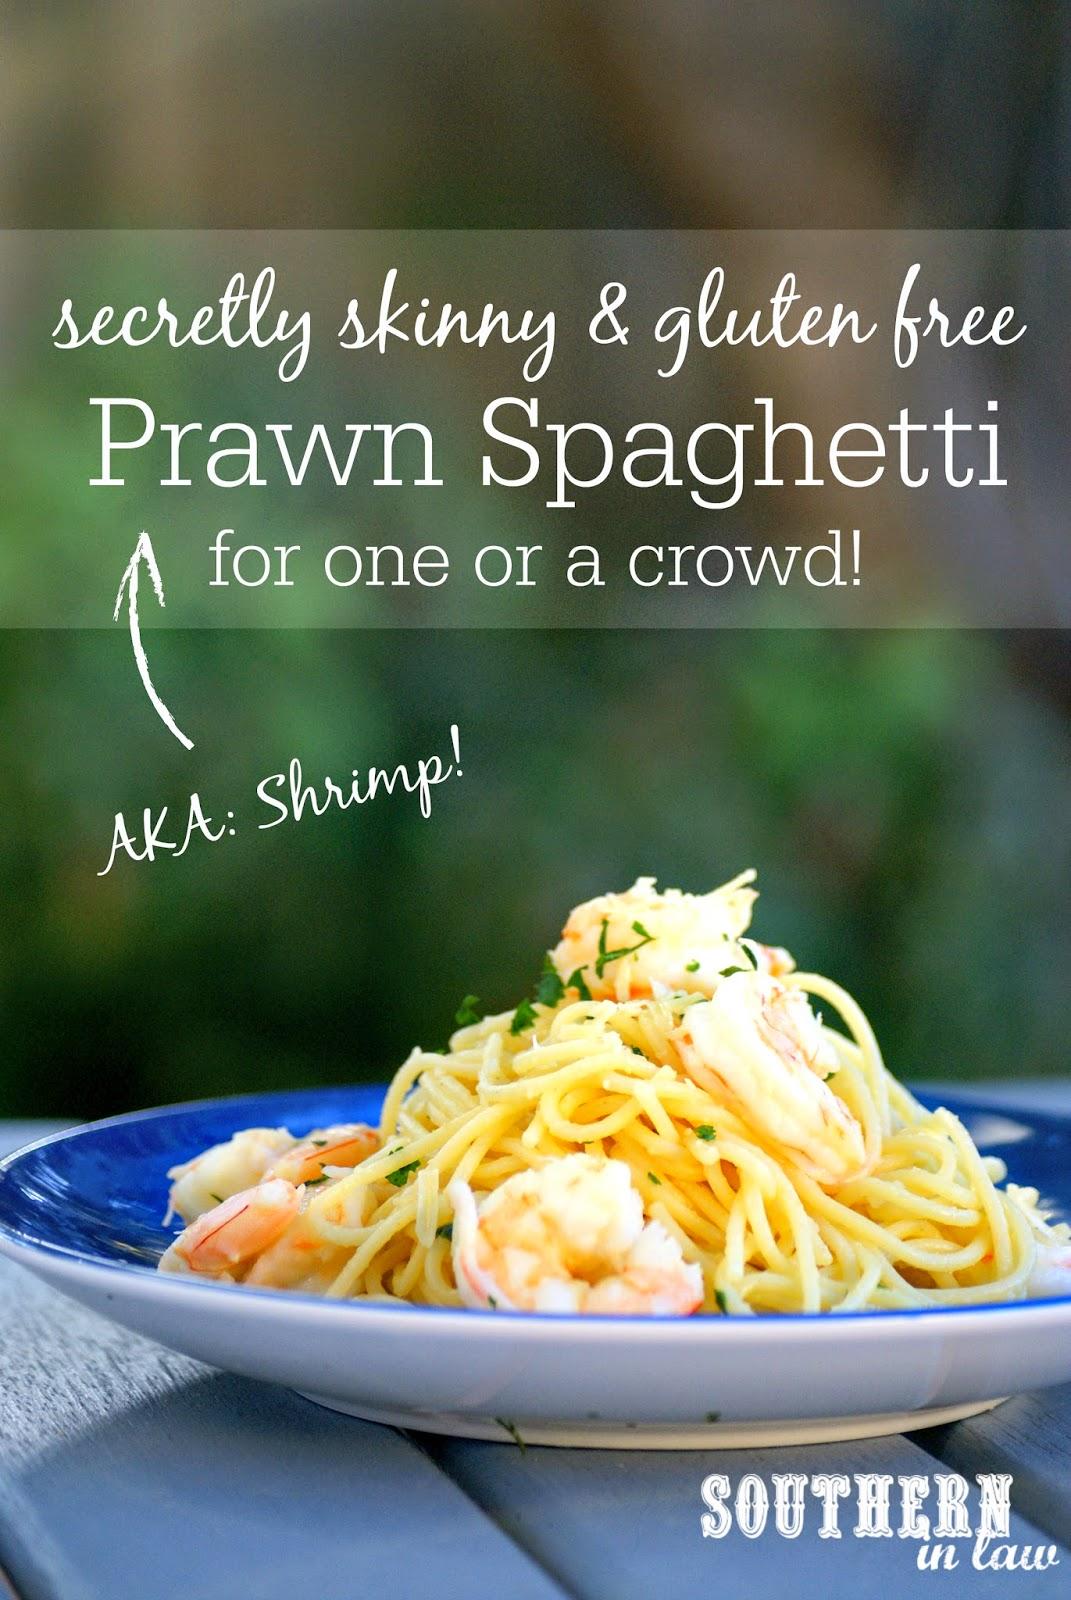 Lightened Up Prawn Spaghetti Recipe - gluten free, low fat, clean eating friendly, healthy spaghetti recipe